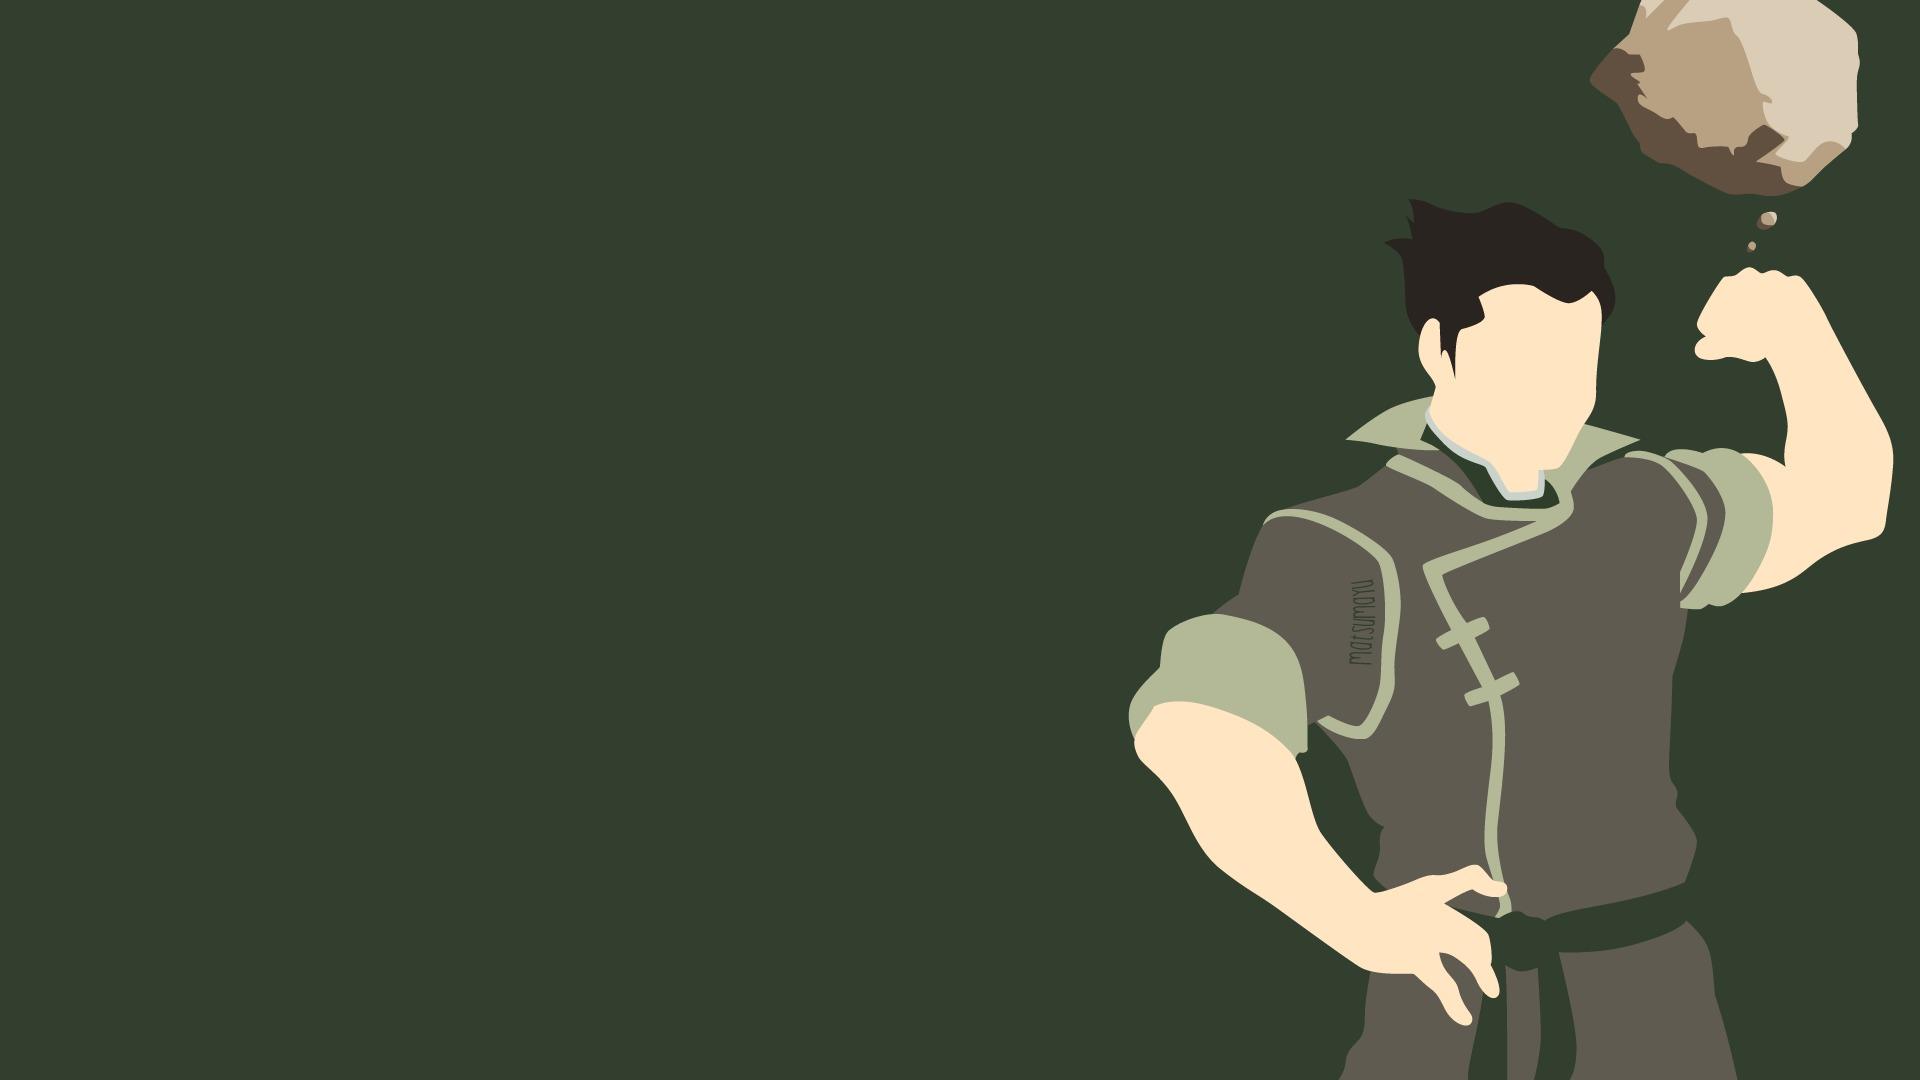 Bolin The Legend Of Korra Wallpaper Hd Anime 4k Wallpapers